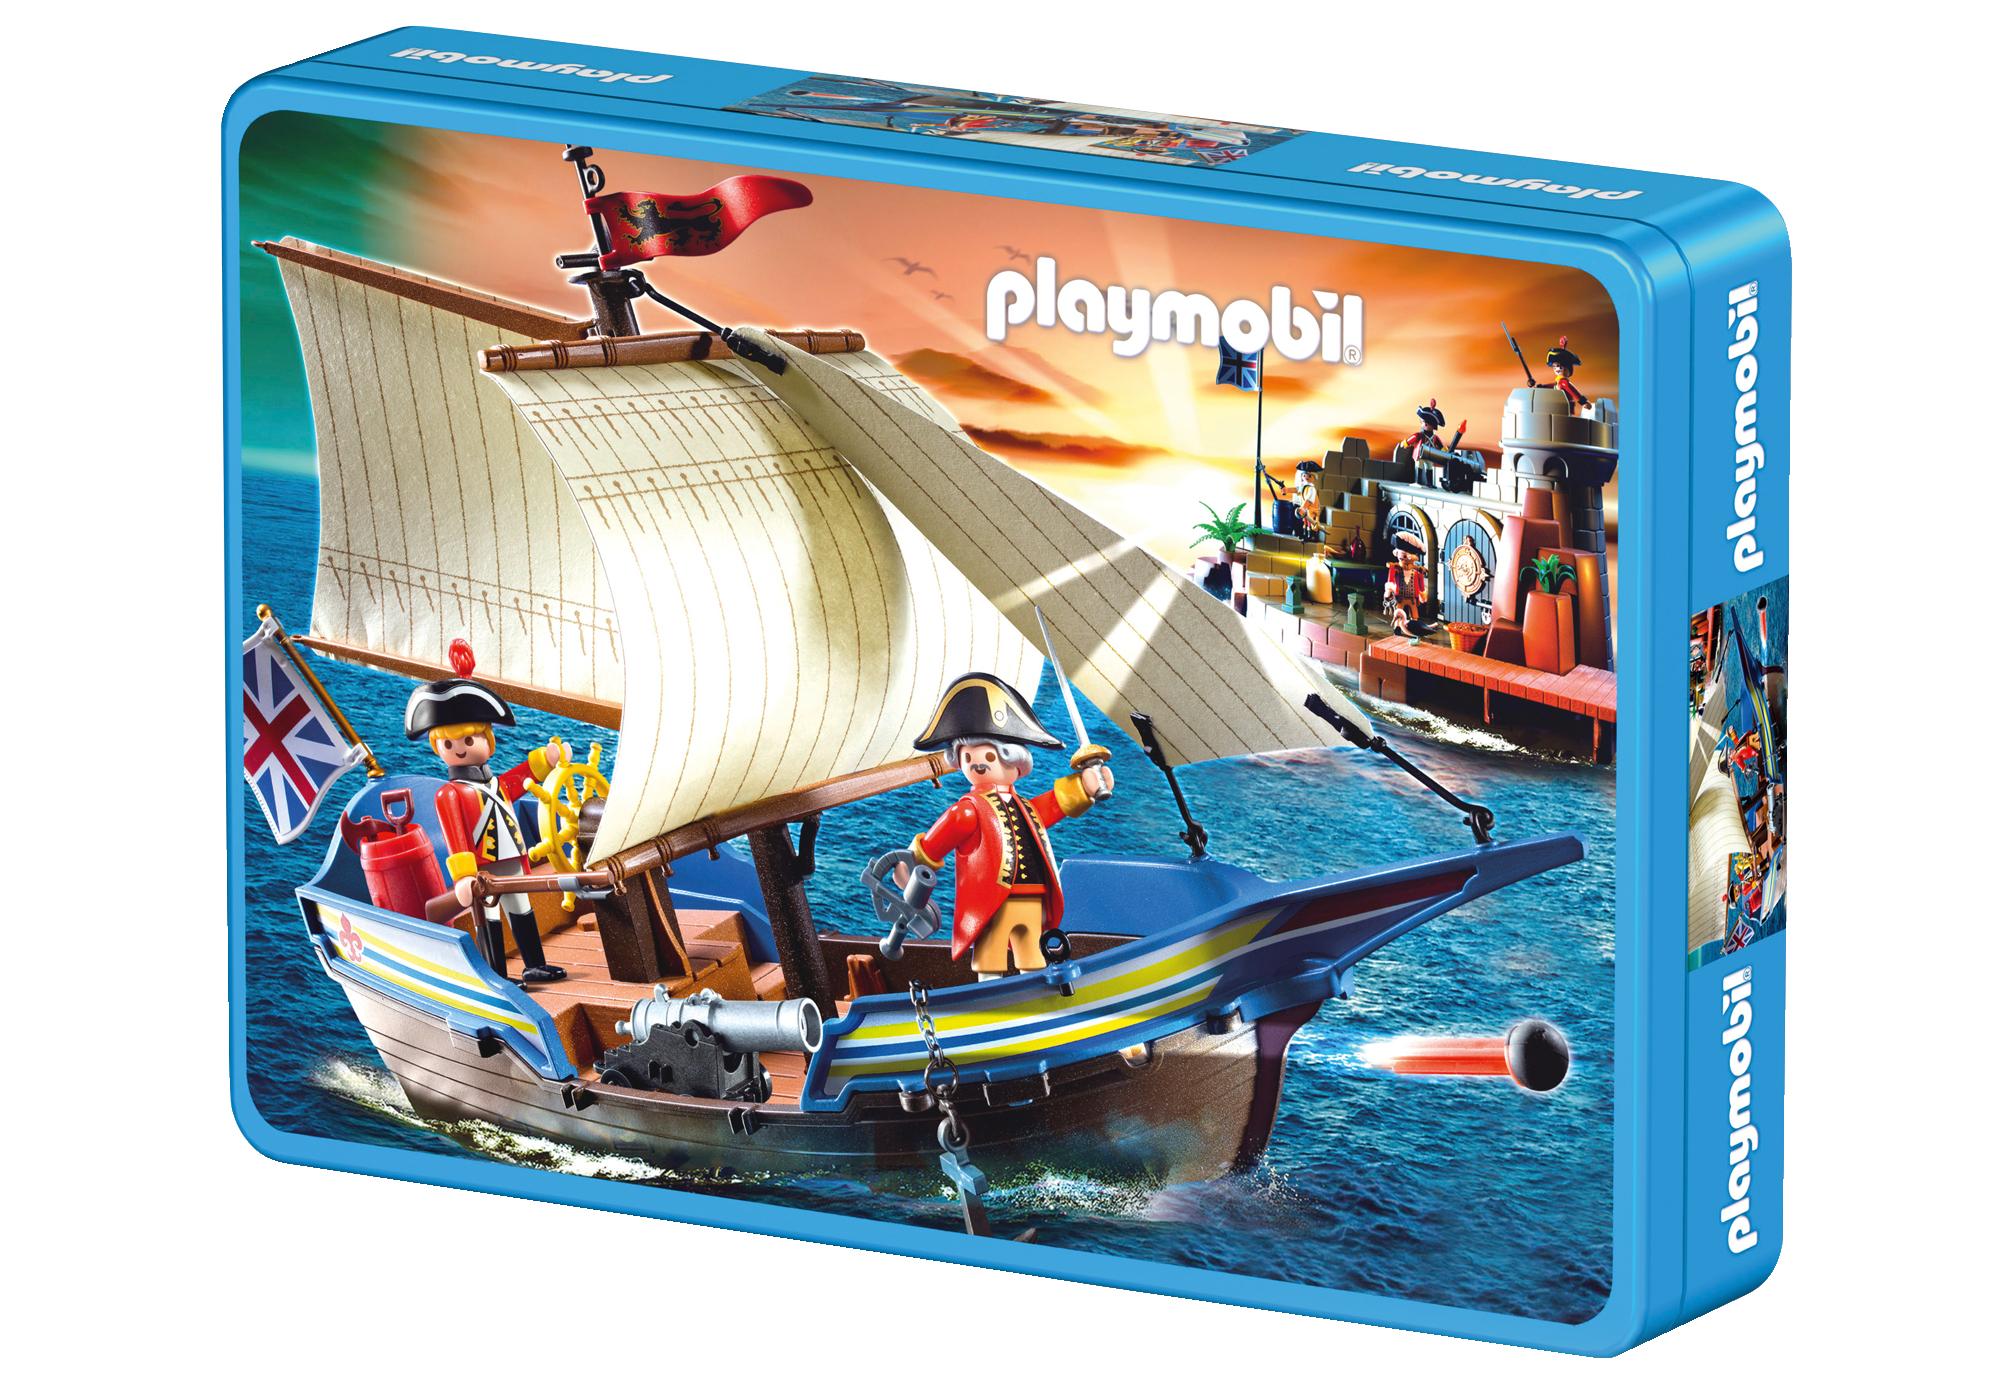 http://media.playmobil.com/i/playmobil/80356_product_detail